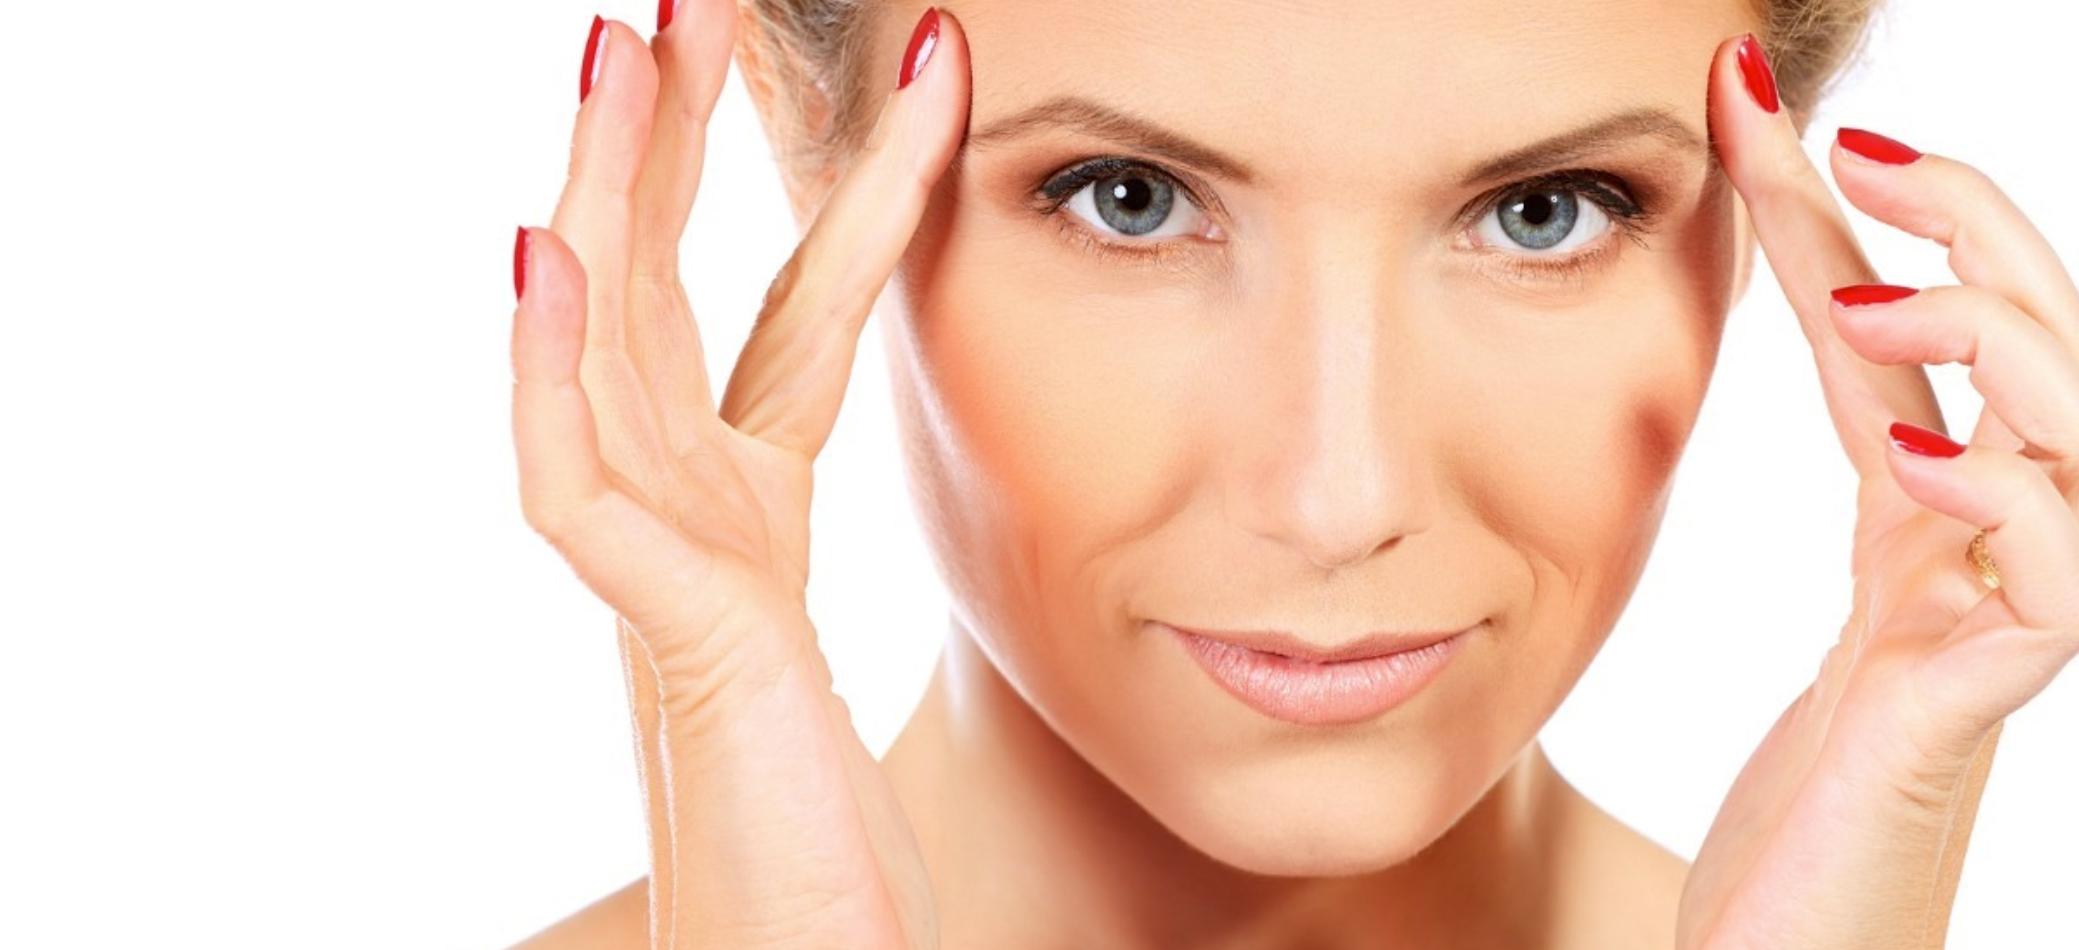 skin-tightening-versus-facelift